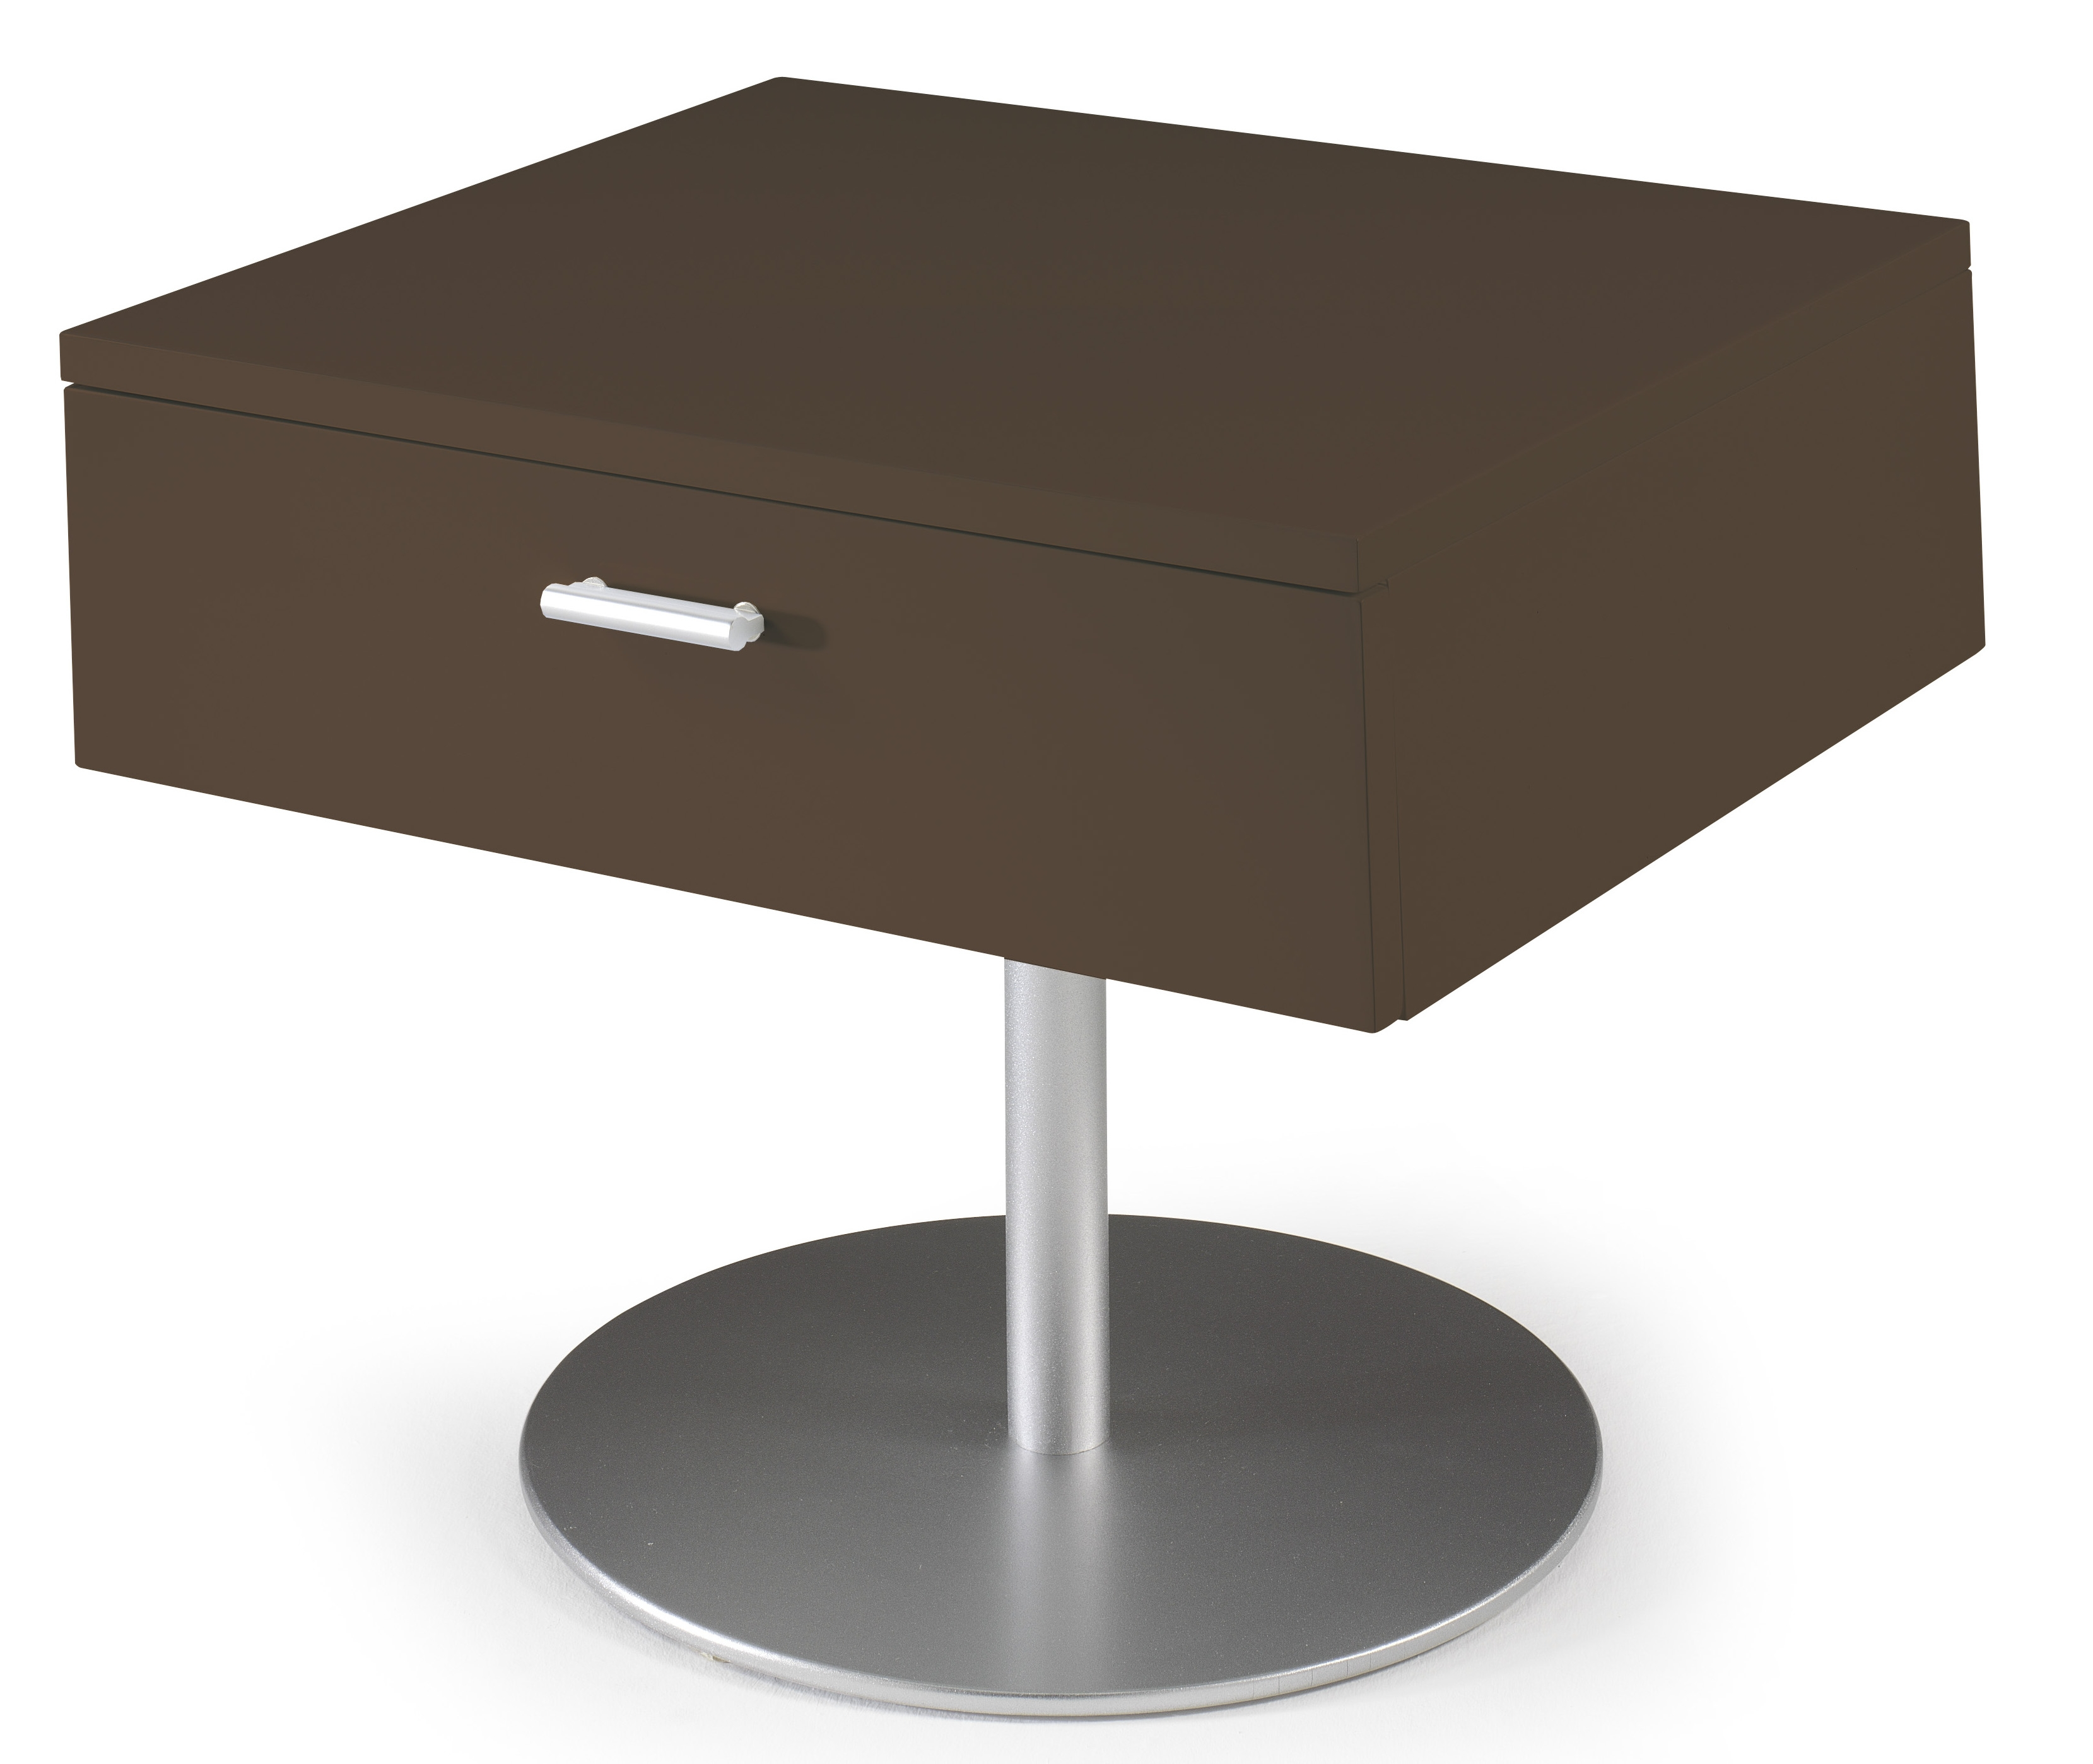 les tendances table de chevet design marron laqu kara. Black Bedroom Furniture Sets. Home Design Ideas